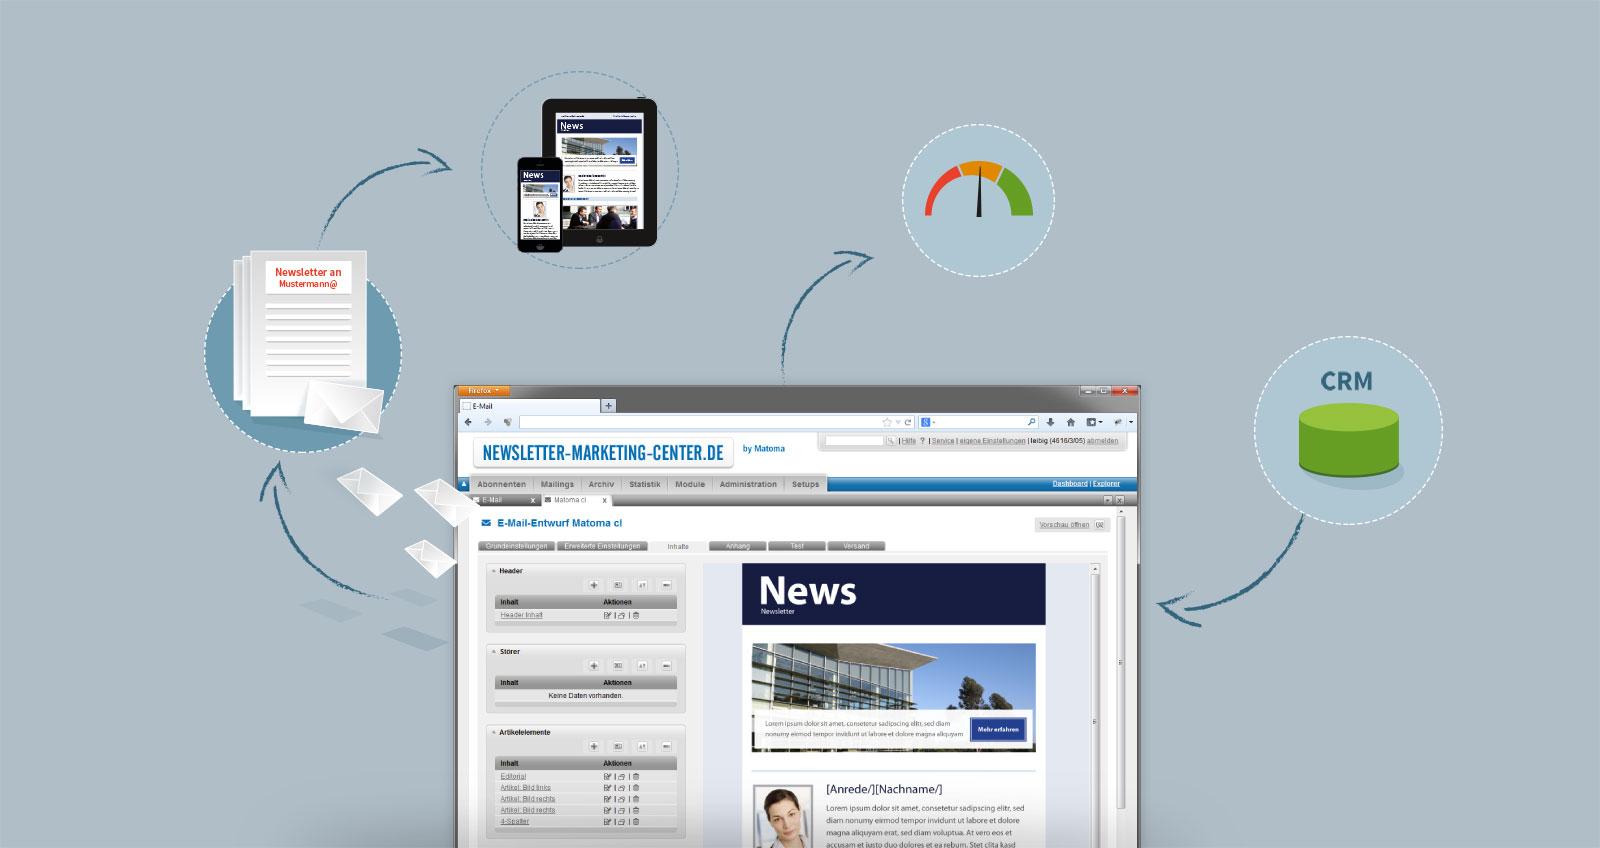 Newsletter-Marketing-Center als Mini-CRM